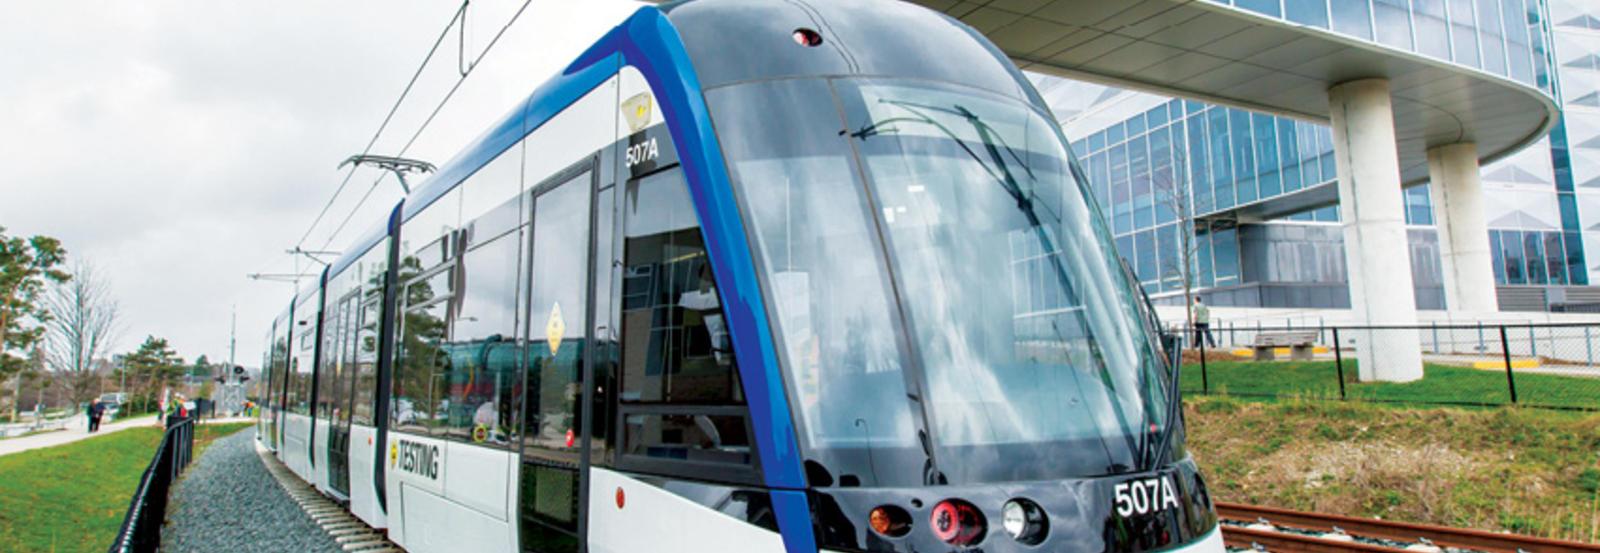 ION light rail transit